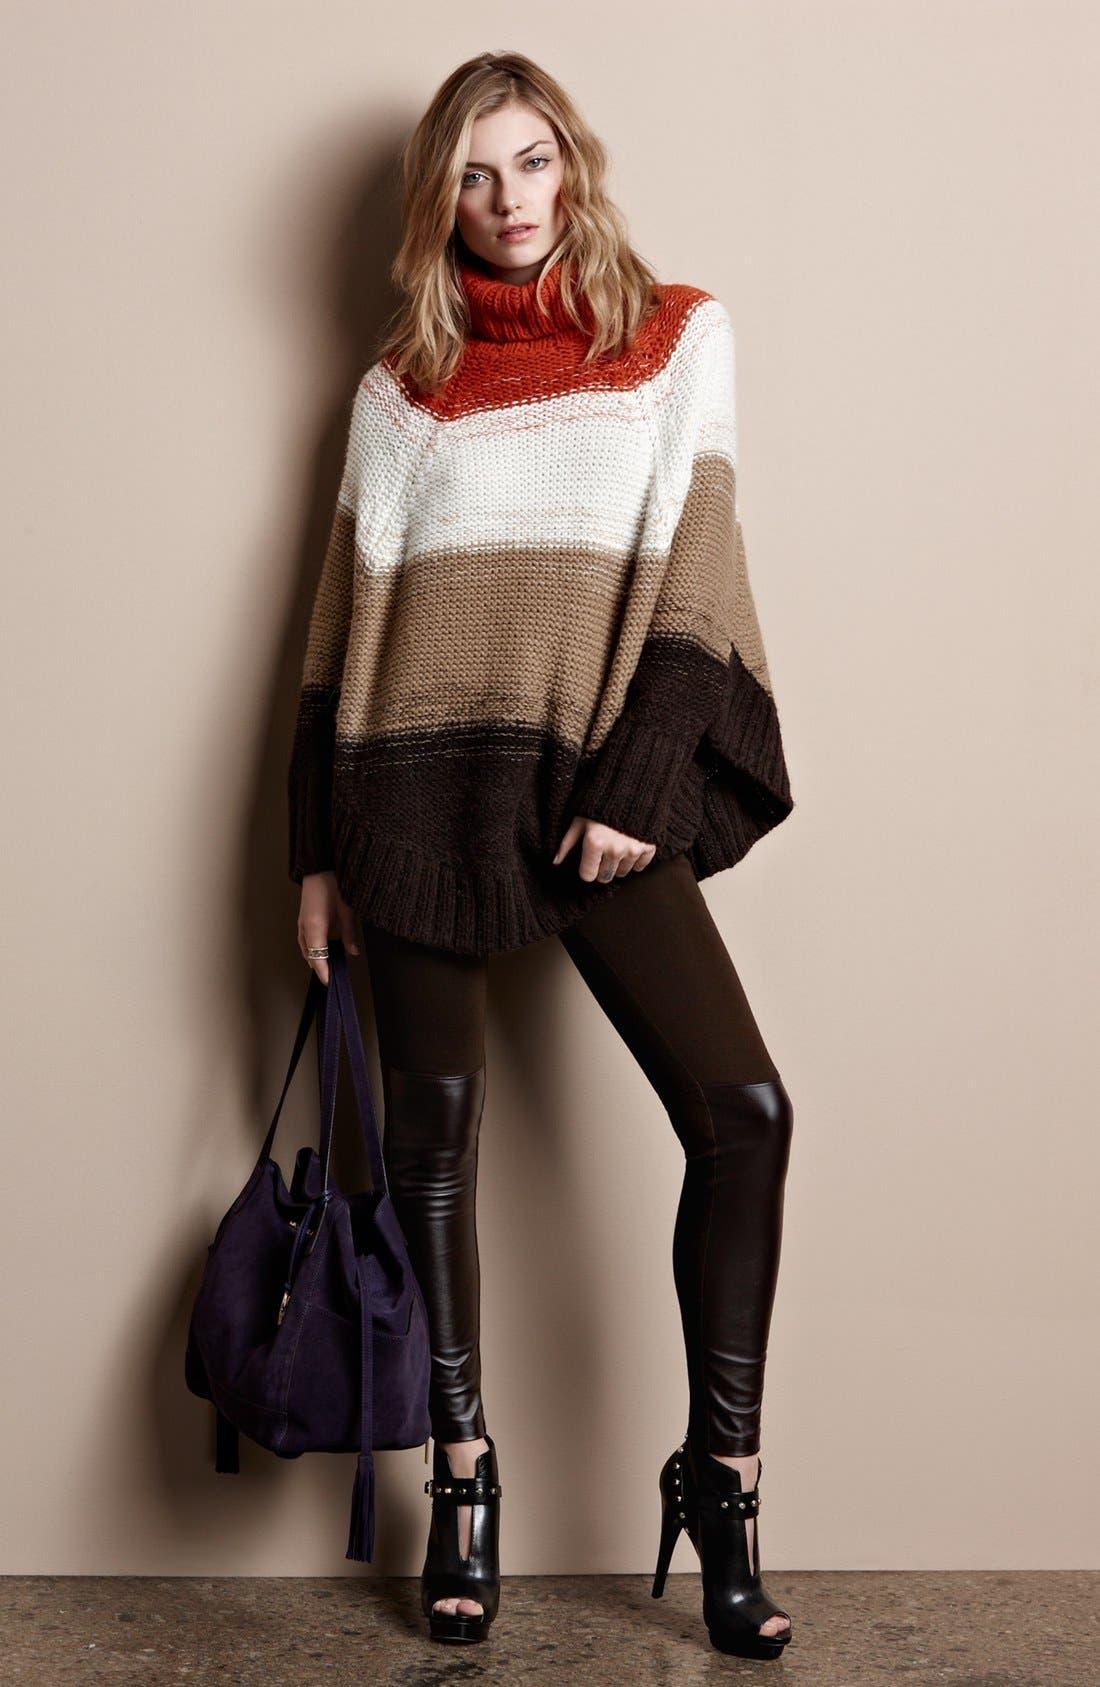 Main Image - MICHAEL Michael Kors Poncho Sweater, Pants & Accessories